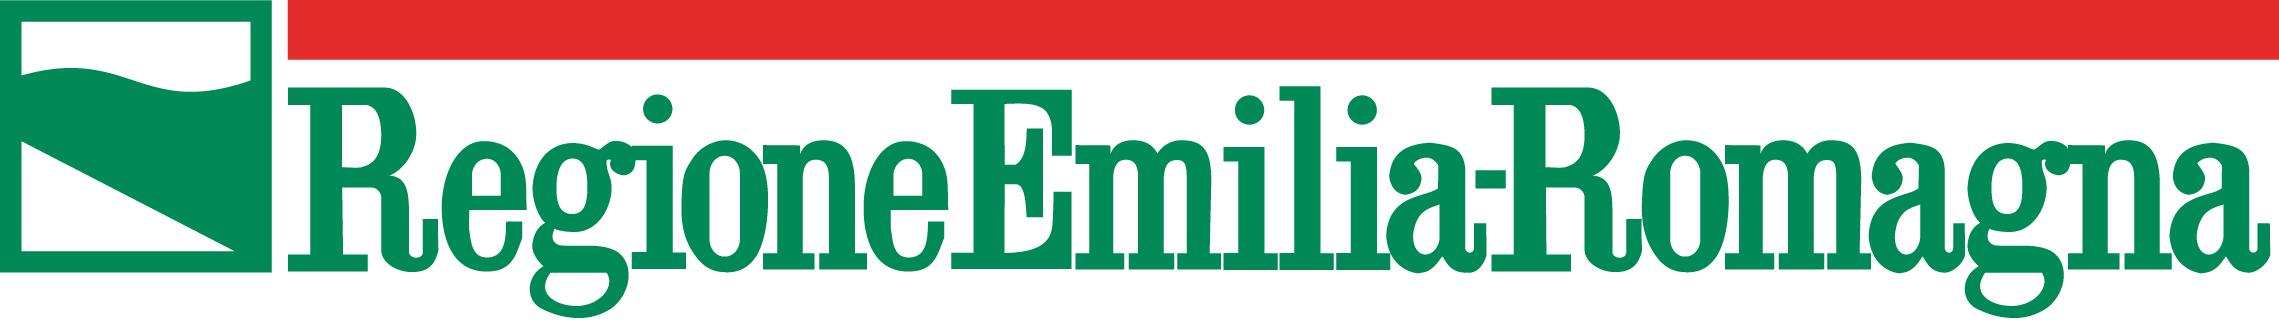 Risultati immagini per regione emilia romagna